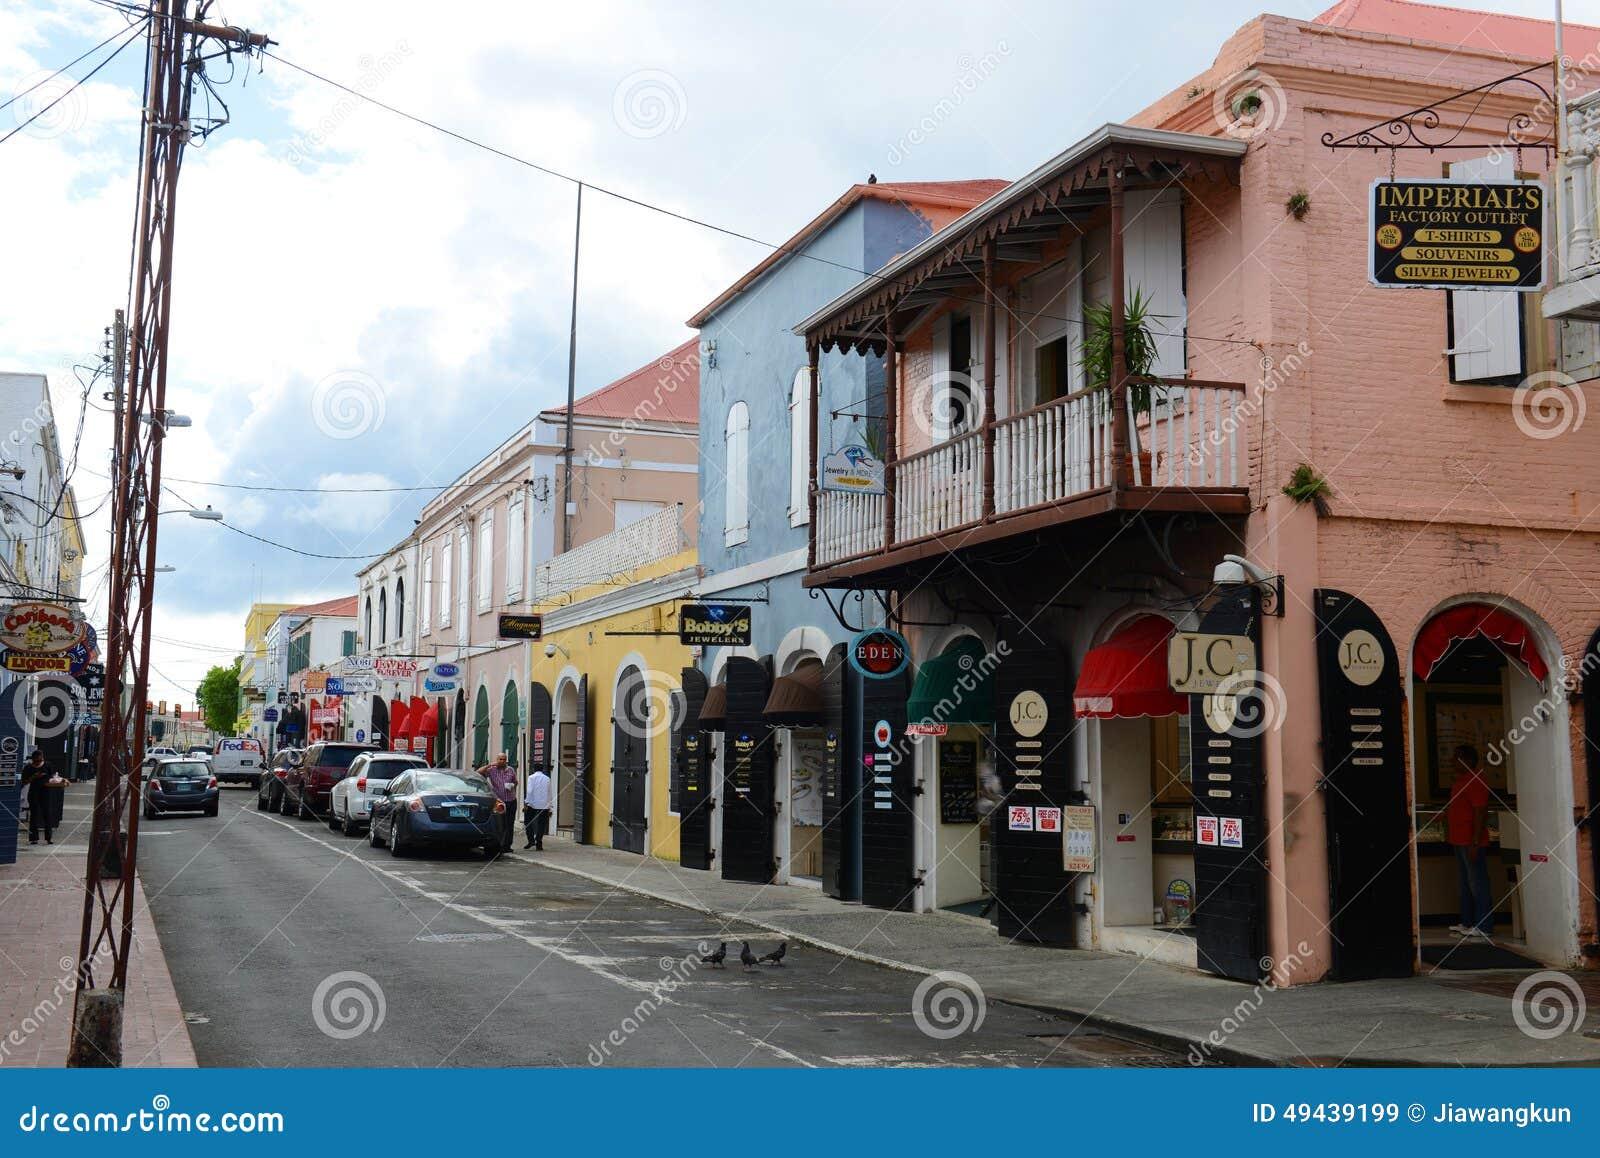 Time In Charlotte Amalie Us Virgin Islands